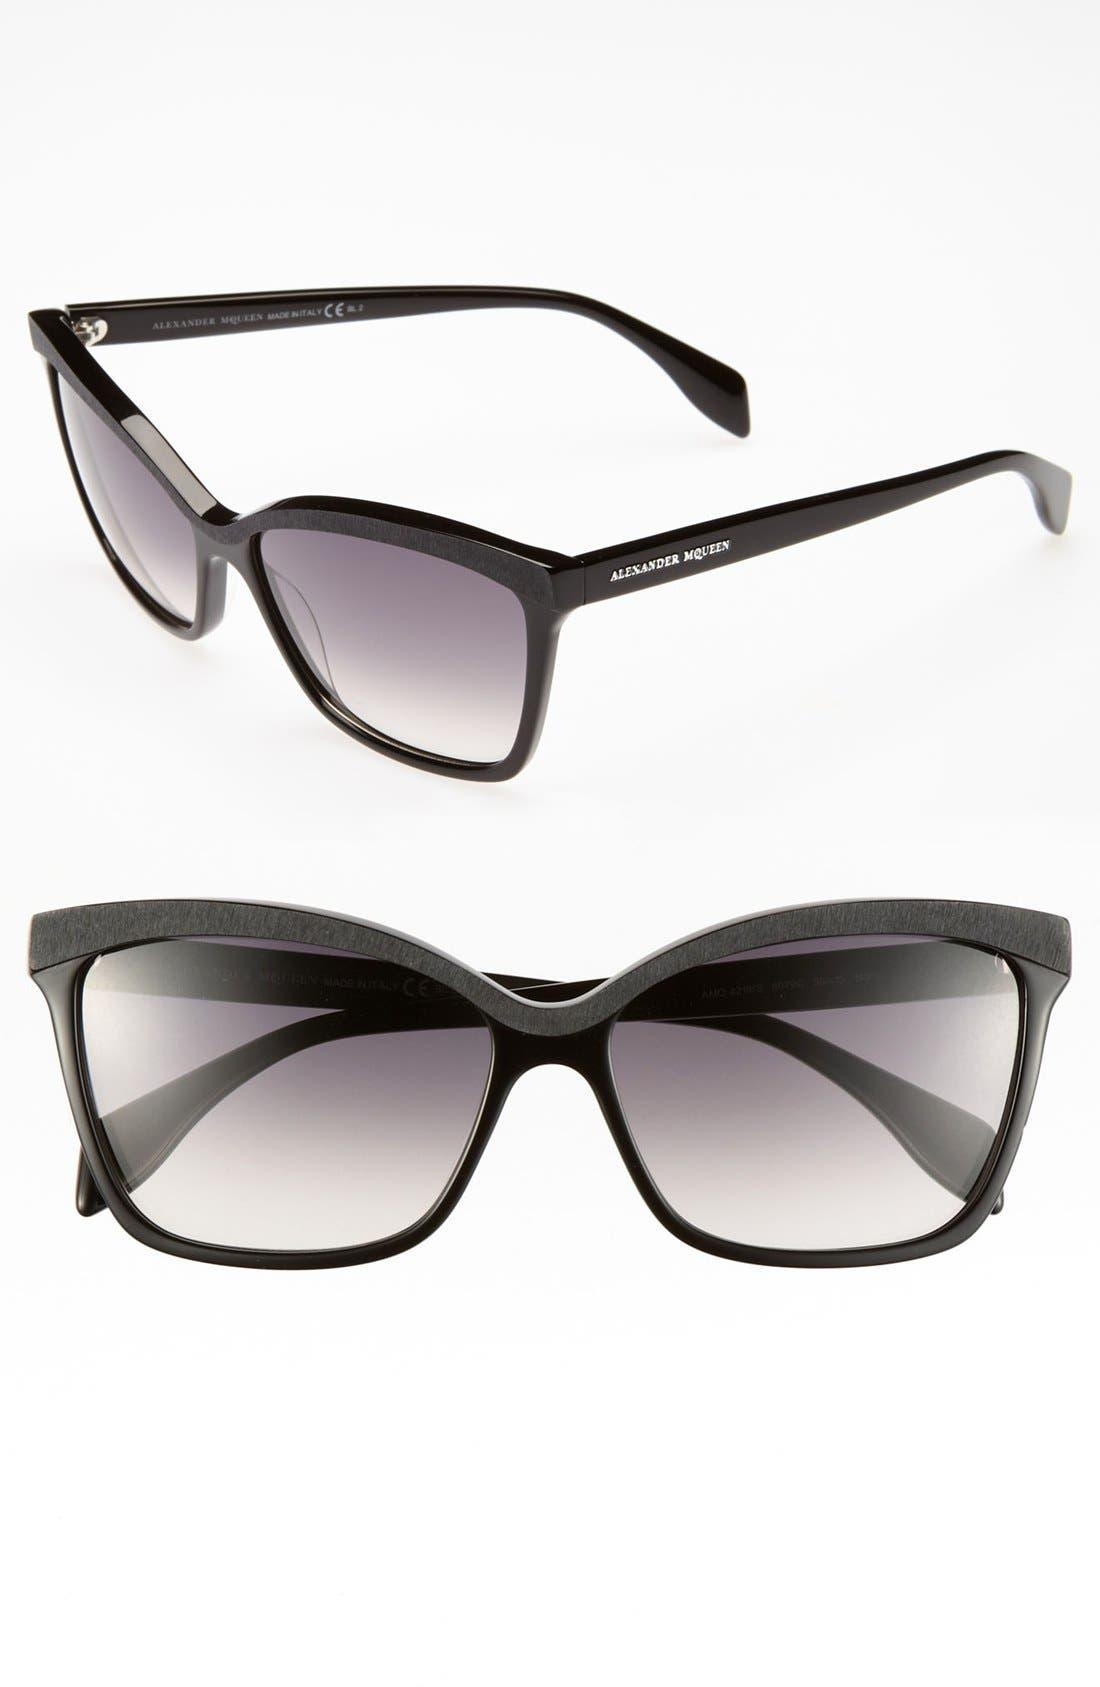 Alternate Image 1 Selected - Alexander McQueen 58mm 'Retro' Sunglasses (Online Only)